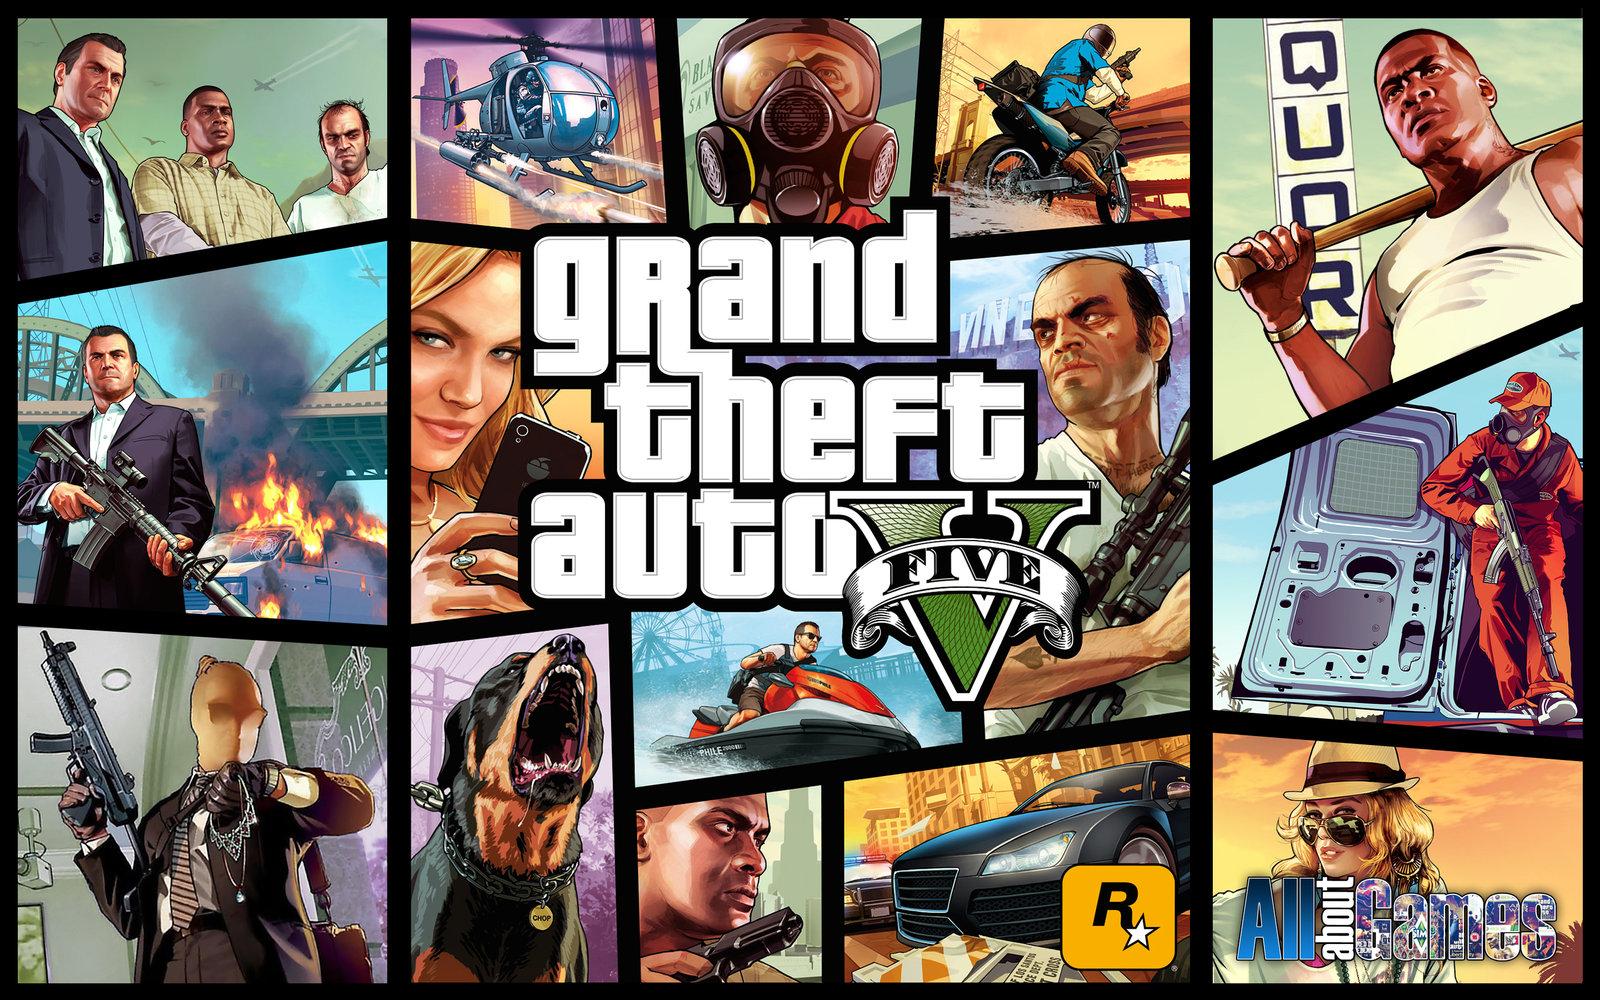 47 Grand Theft Auto V Wallpapers On Wallpapersafari